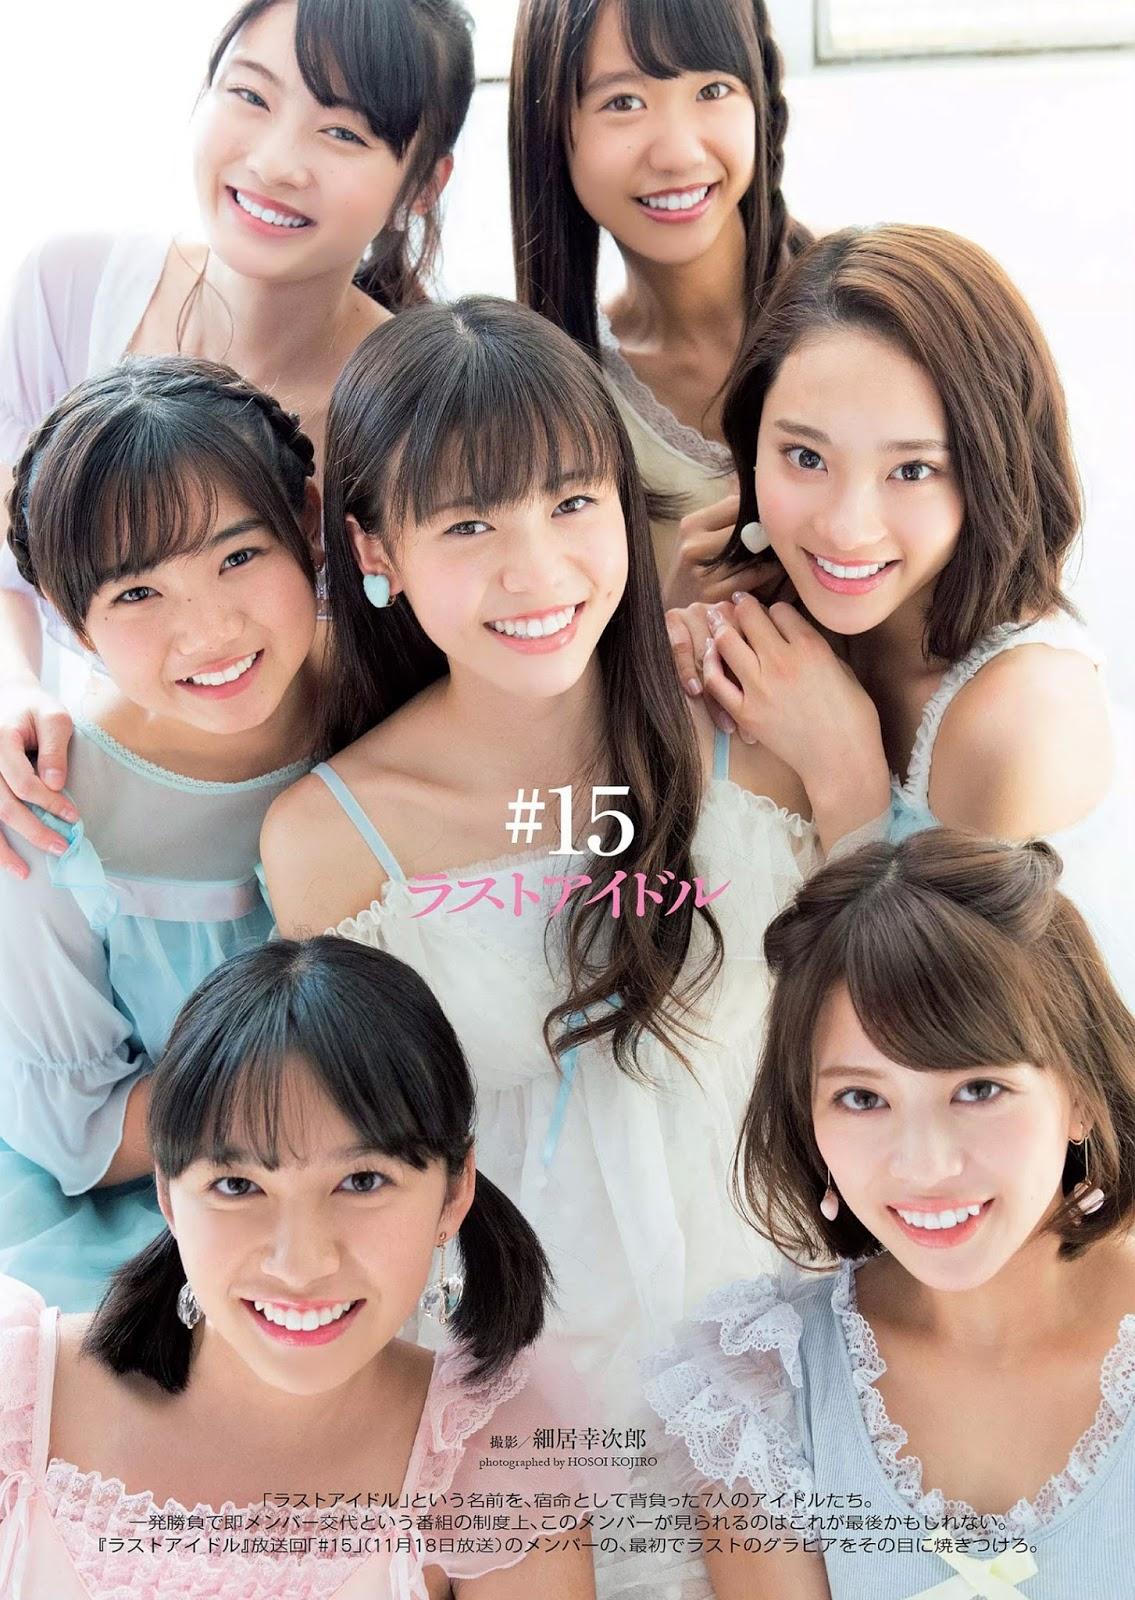 Last Idol ラストアイドル, Weekly Playboy 2017 No.50 (週刊プレイボーイ 2017年50号)